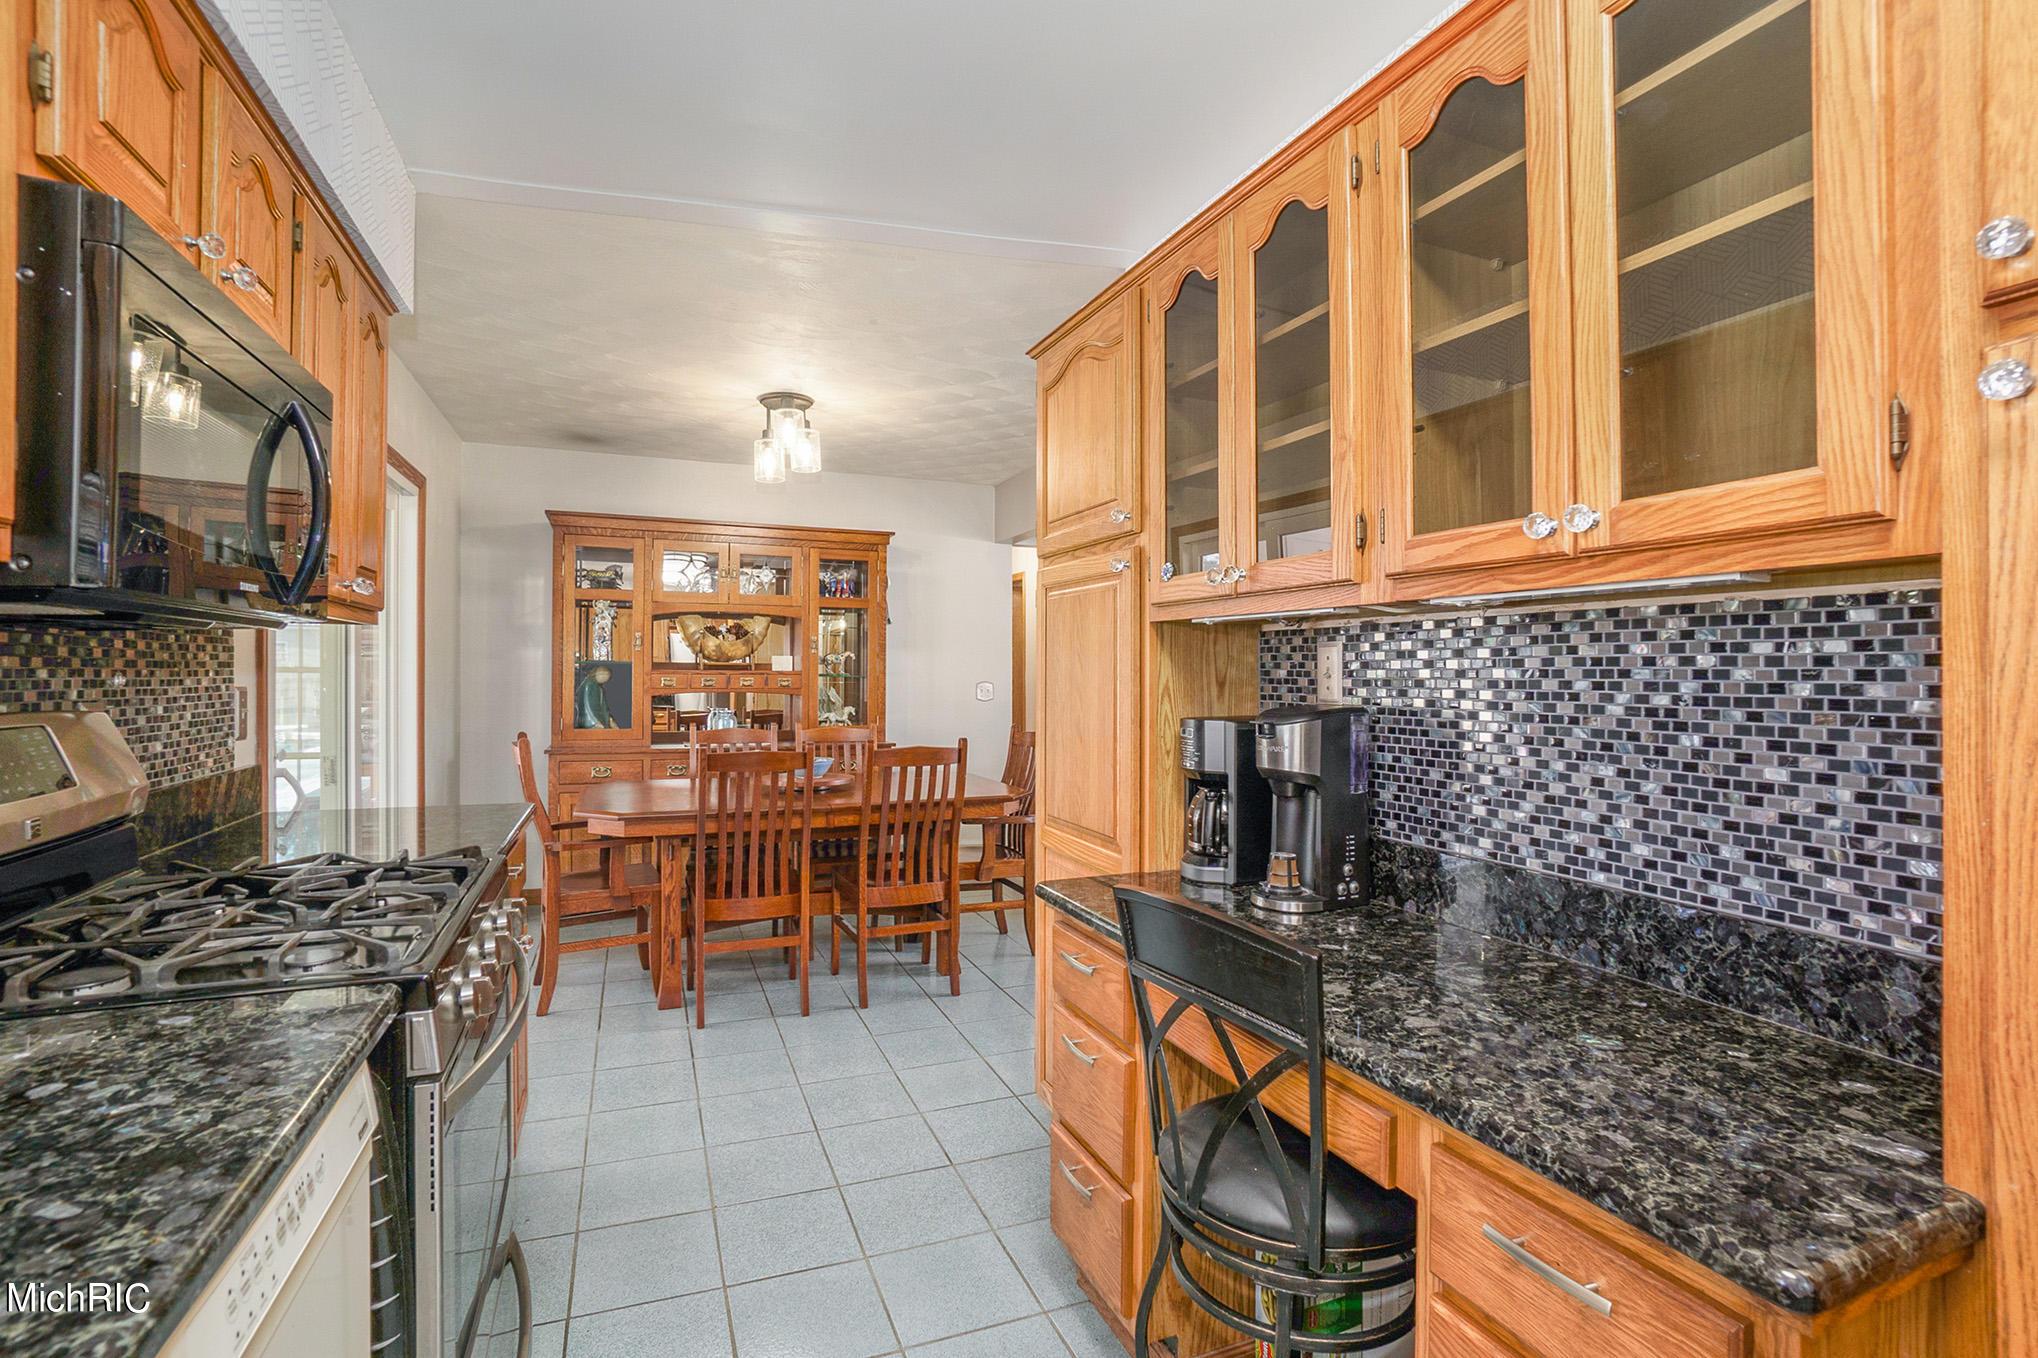 Sold 10769 E De Avenue Richland Mi 49083 3 Beds 3 Full Baths 1 Half Bath 520 000 Sold Listing Mls 21006992